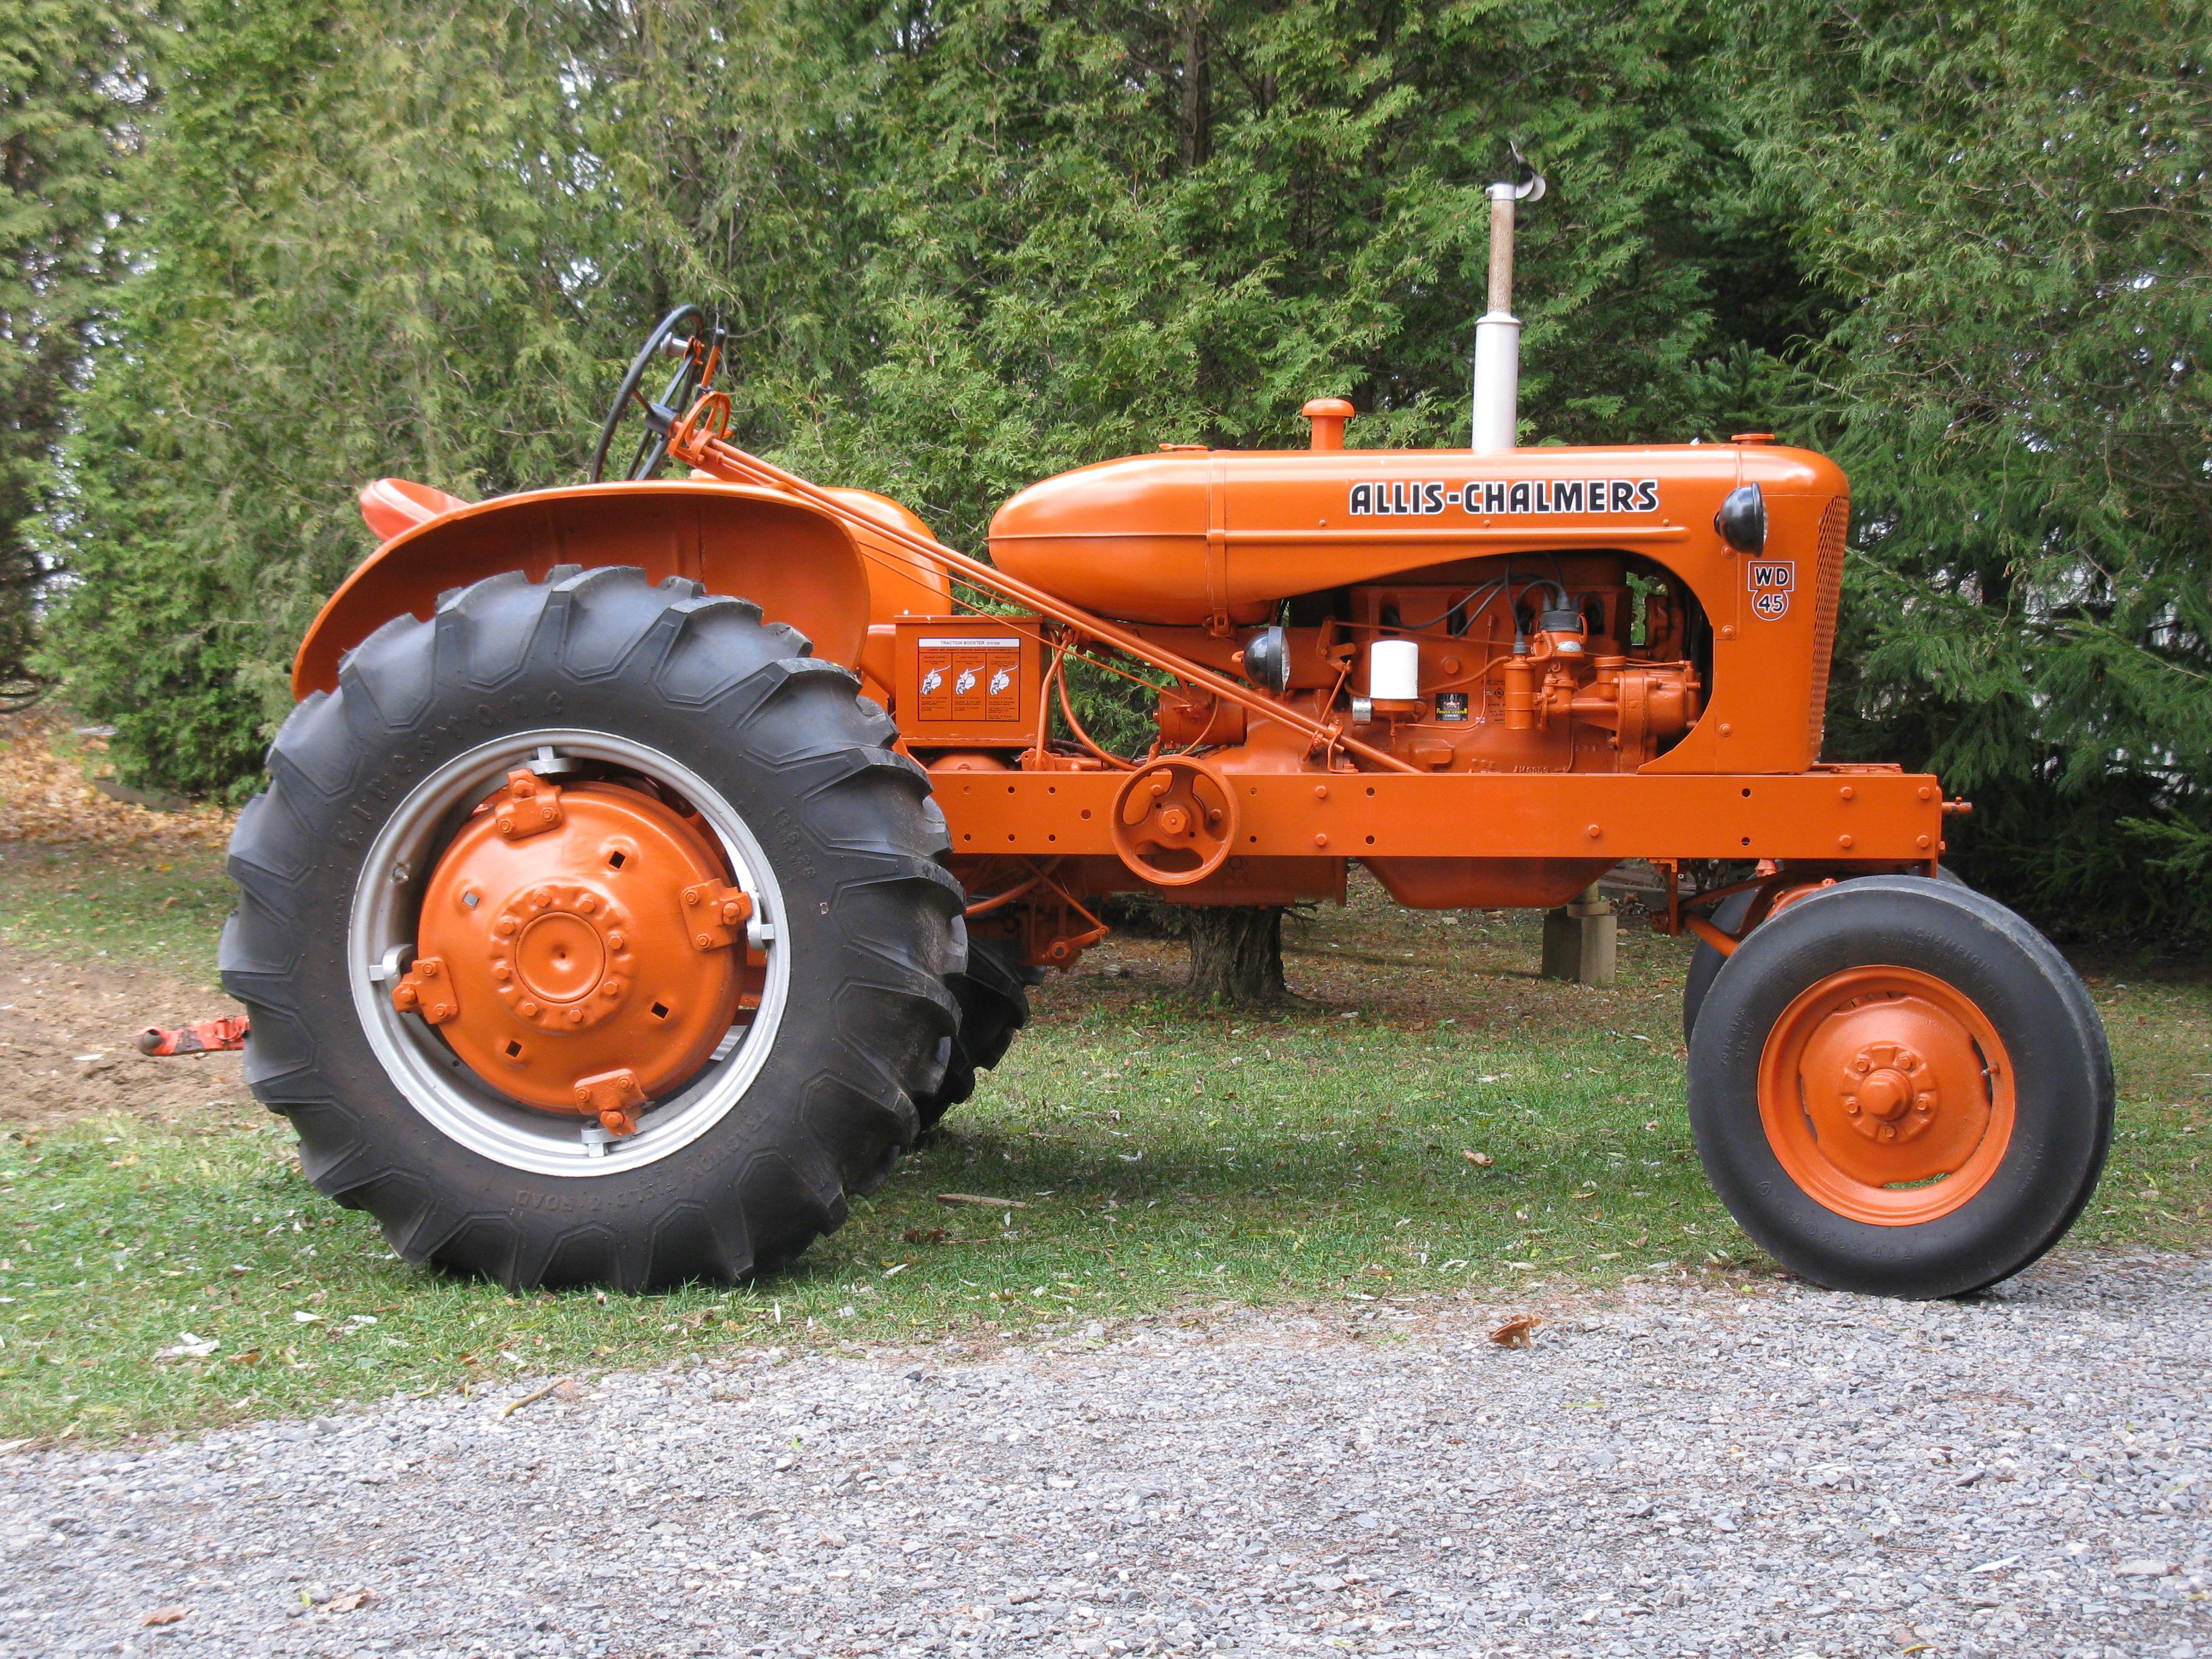 1954 Allis Chalmers WD45 - Antique Tractor Blog